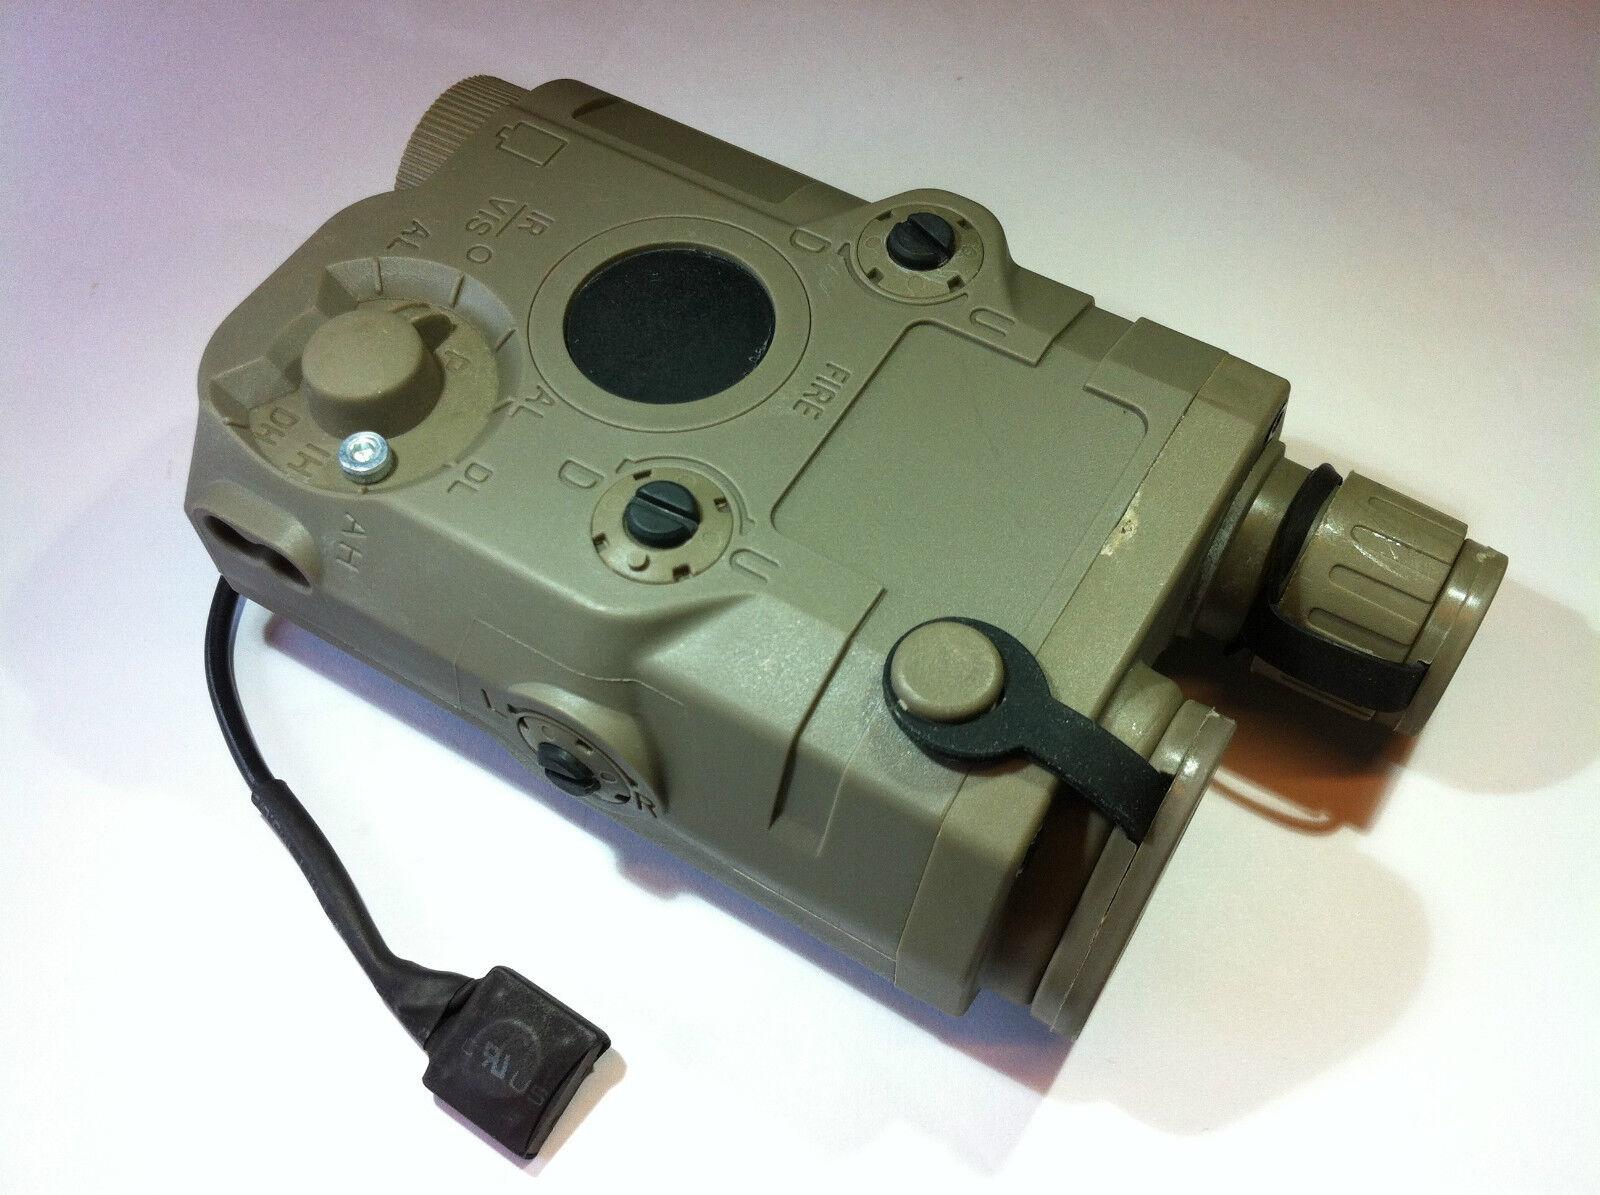 BATTLEAXE PEQ-15 Green Laser&Battery Case for Airsoft Marui AEG GBB (Tan)